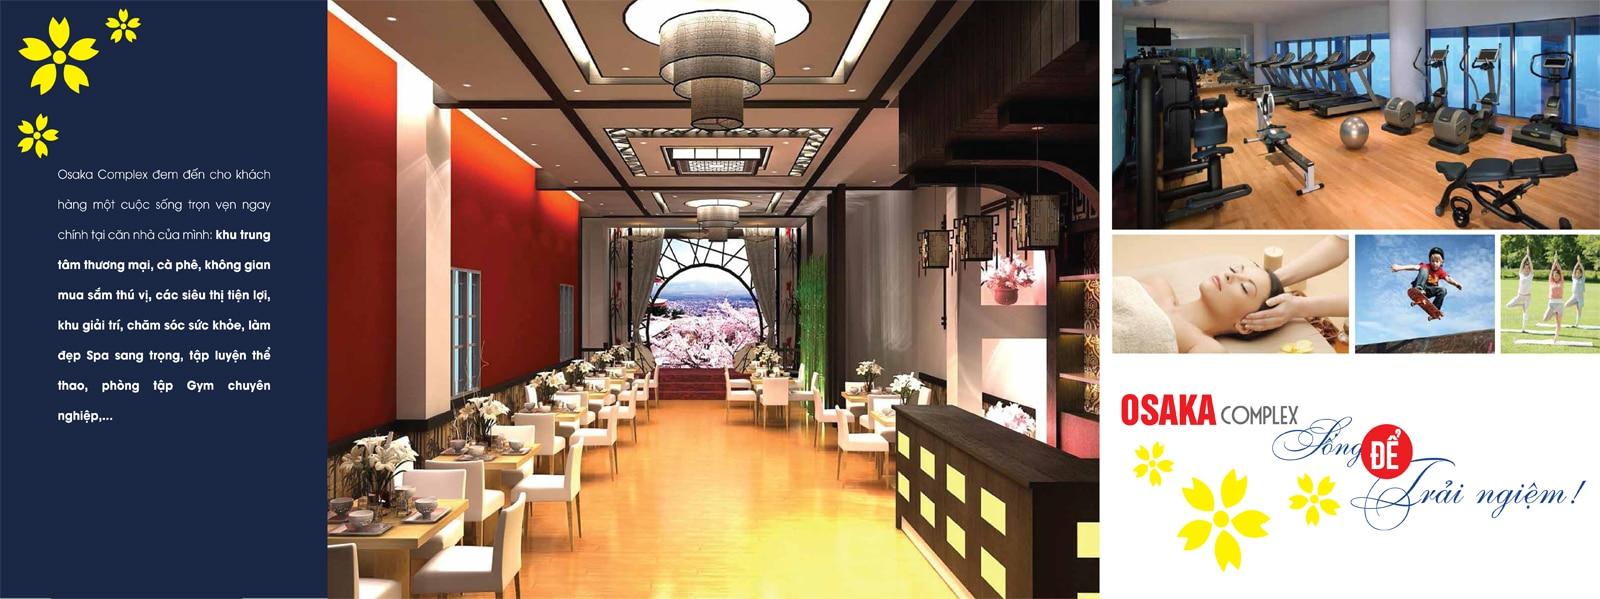 Chung cư Osaka Complex 48 Ngọc Hồi mở bán Tòa Osaka Skyline Complex tiện ích cao cấp